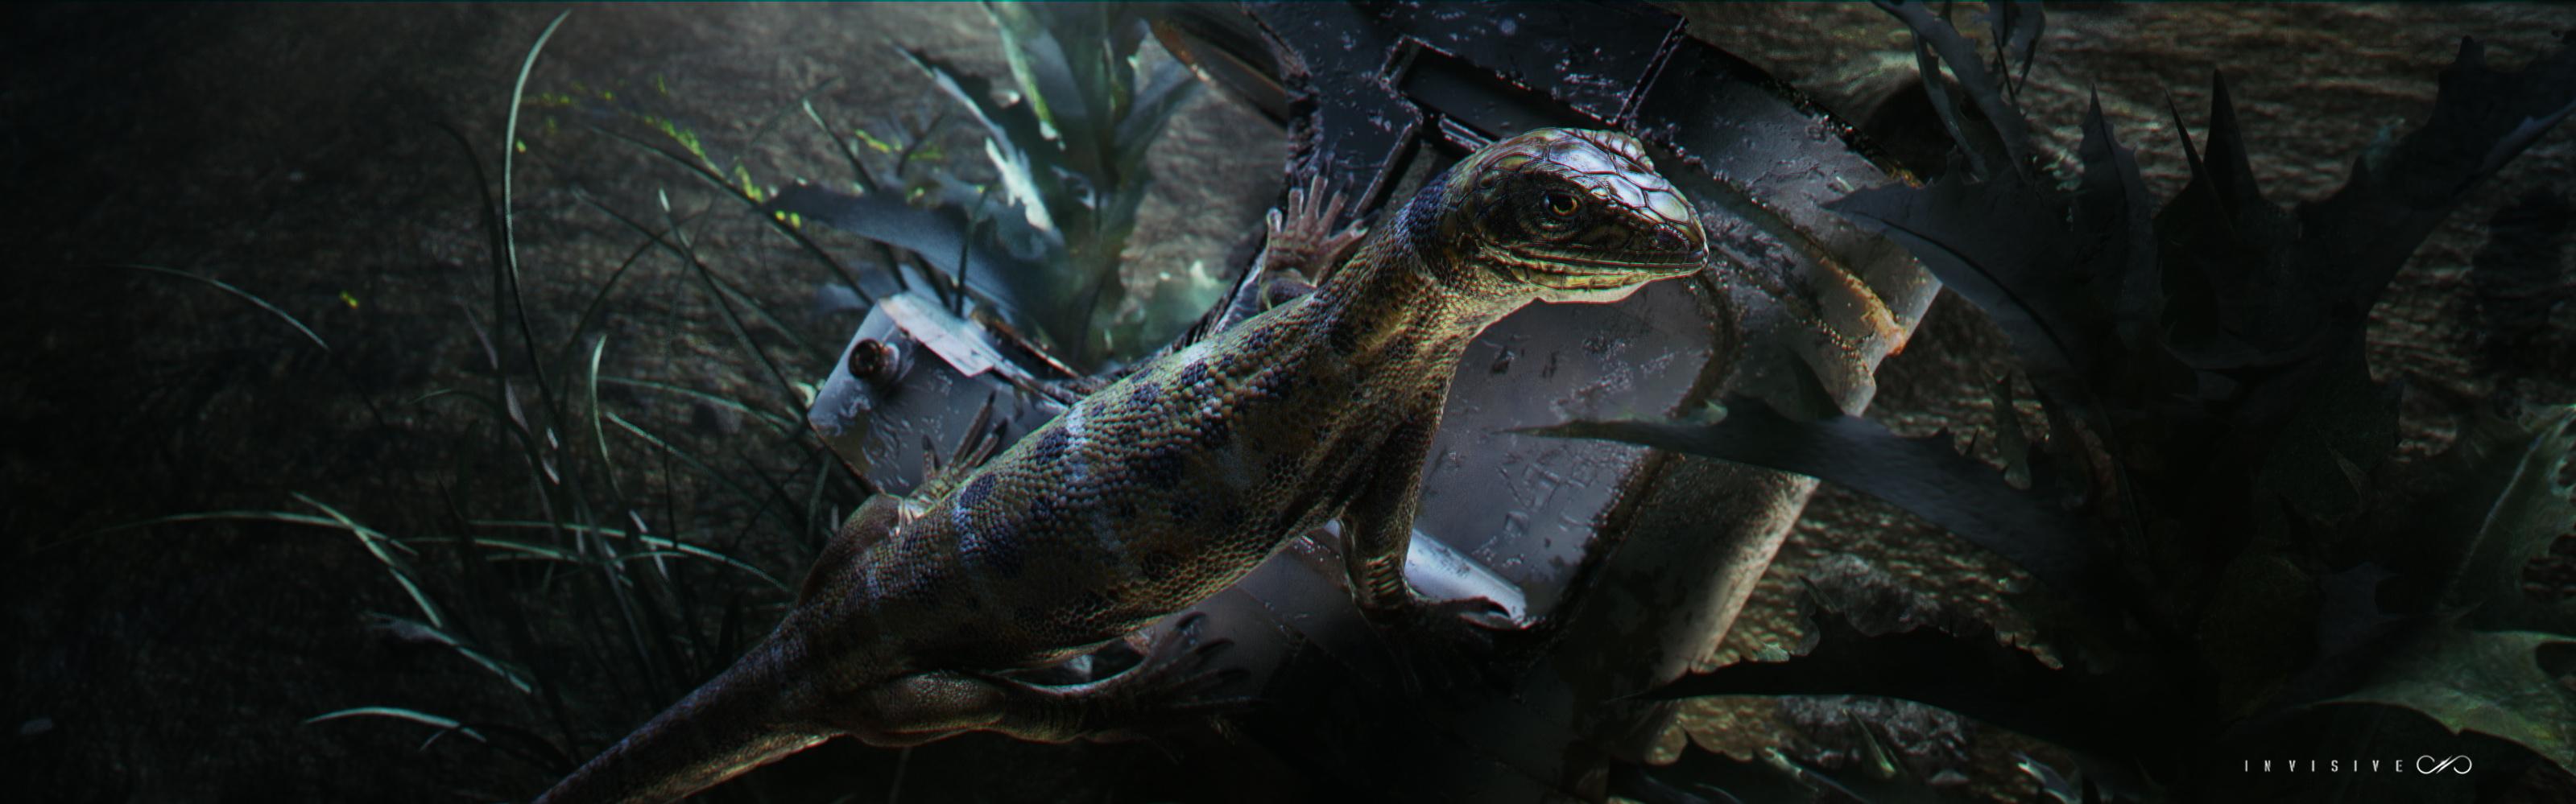 Test render of lizard